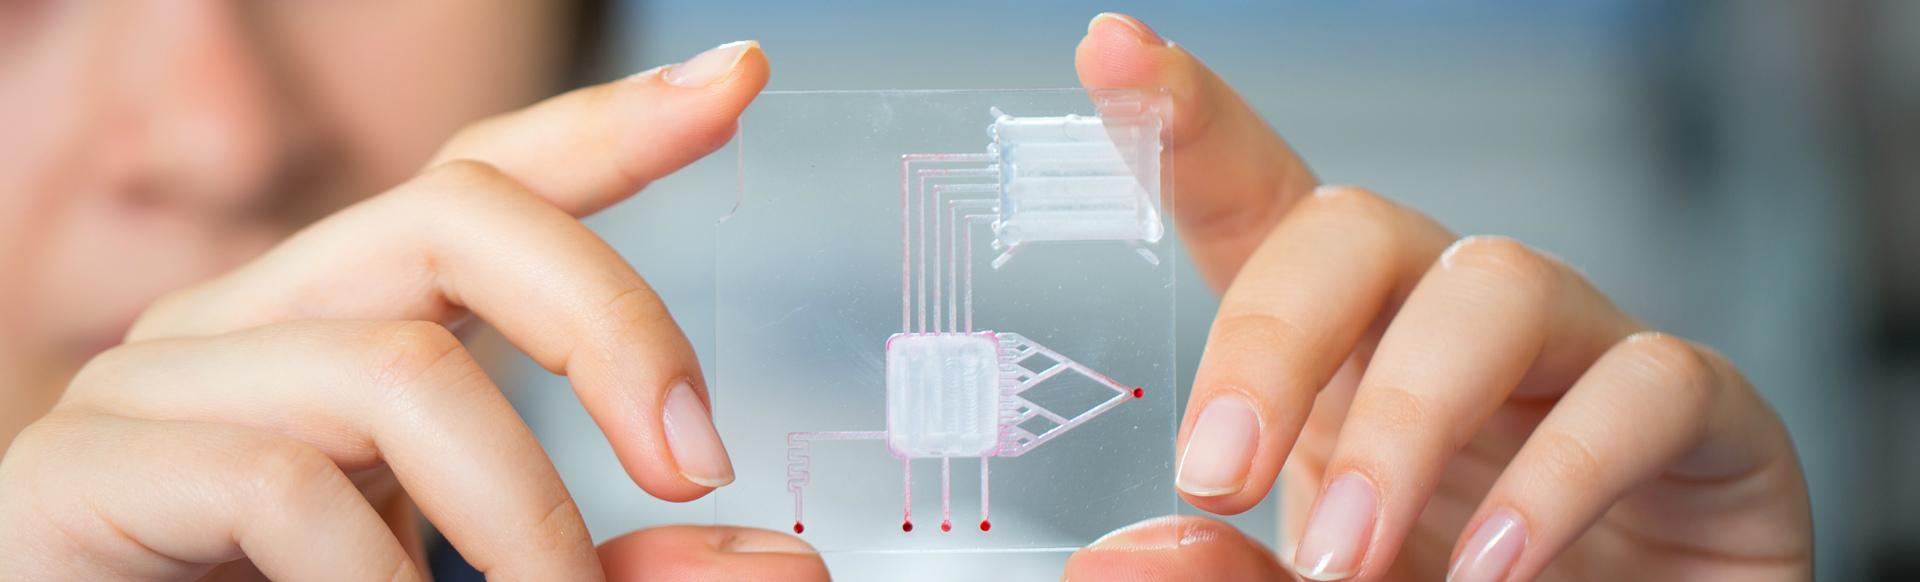 Technology computer chip